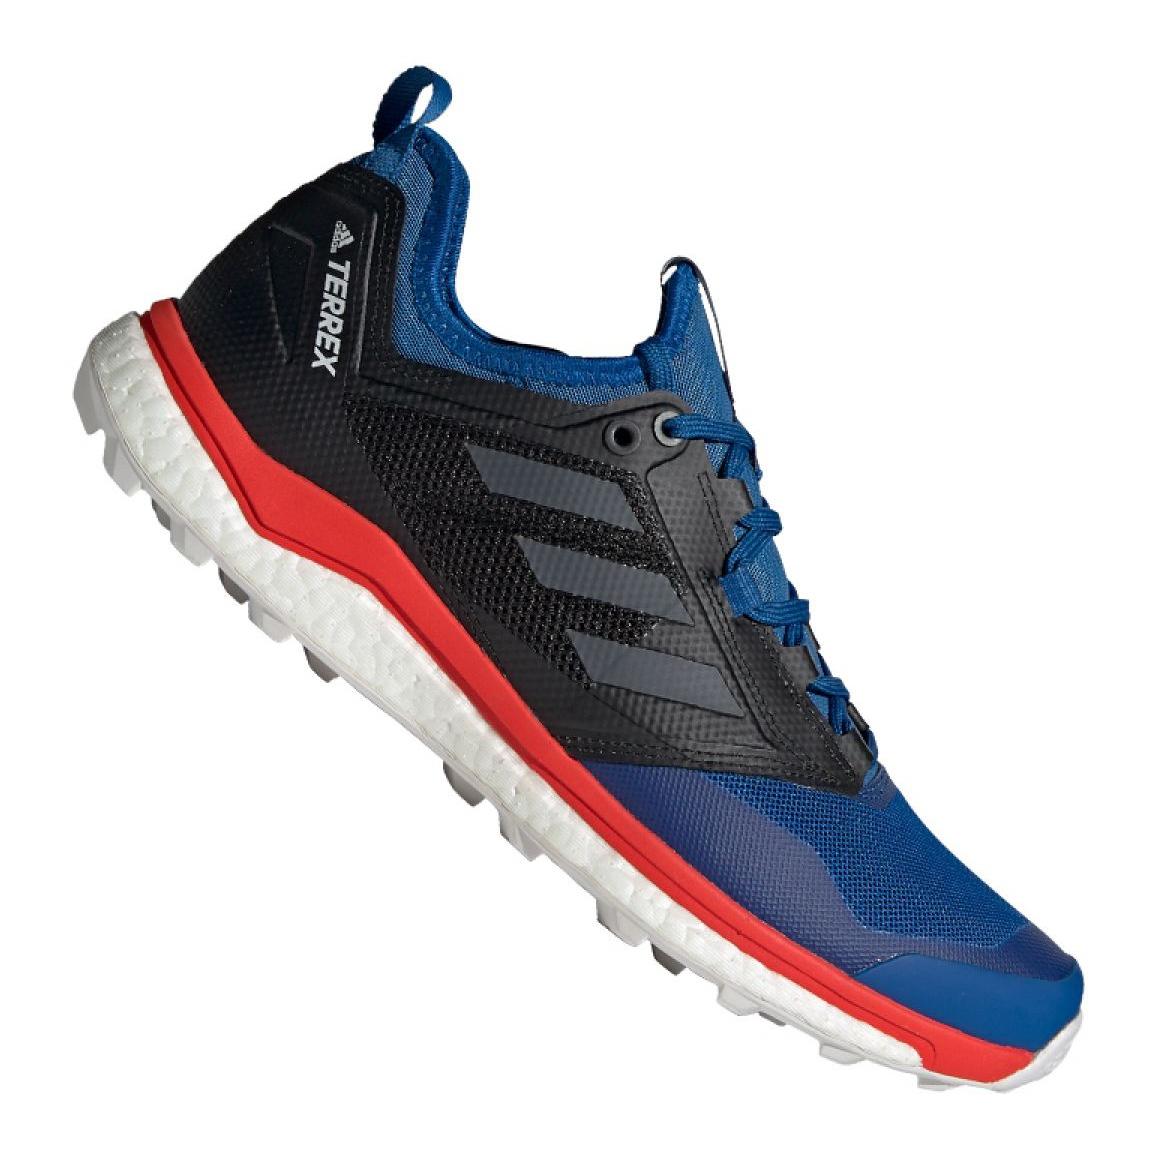 Adidas Terrex Agravic Xt M BC0420 Schuhe